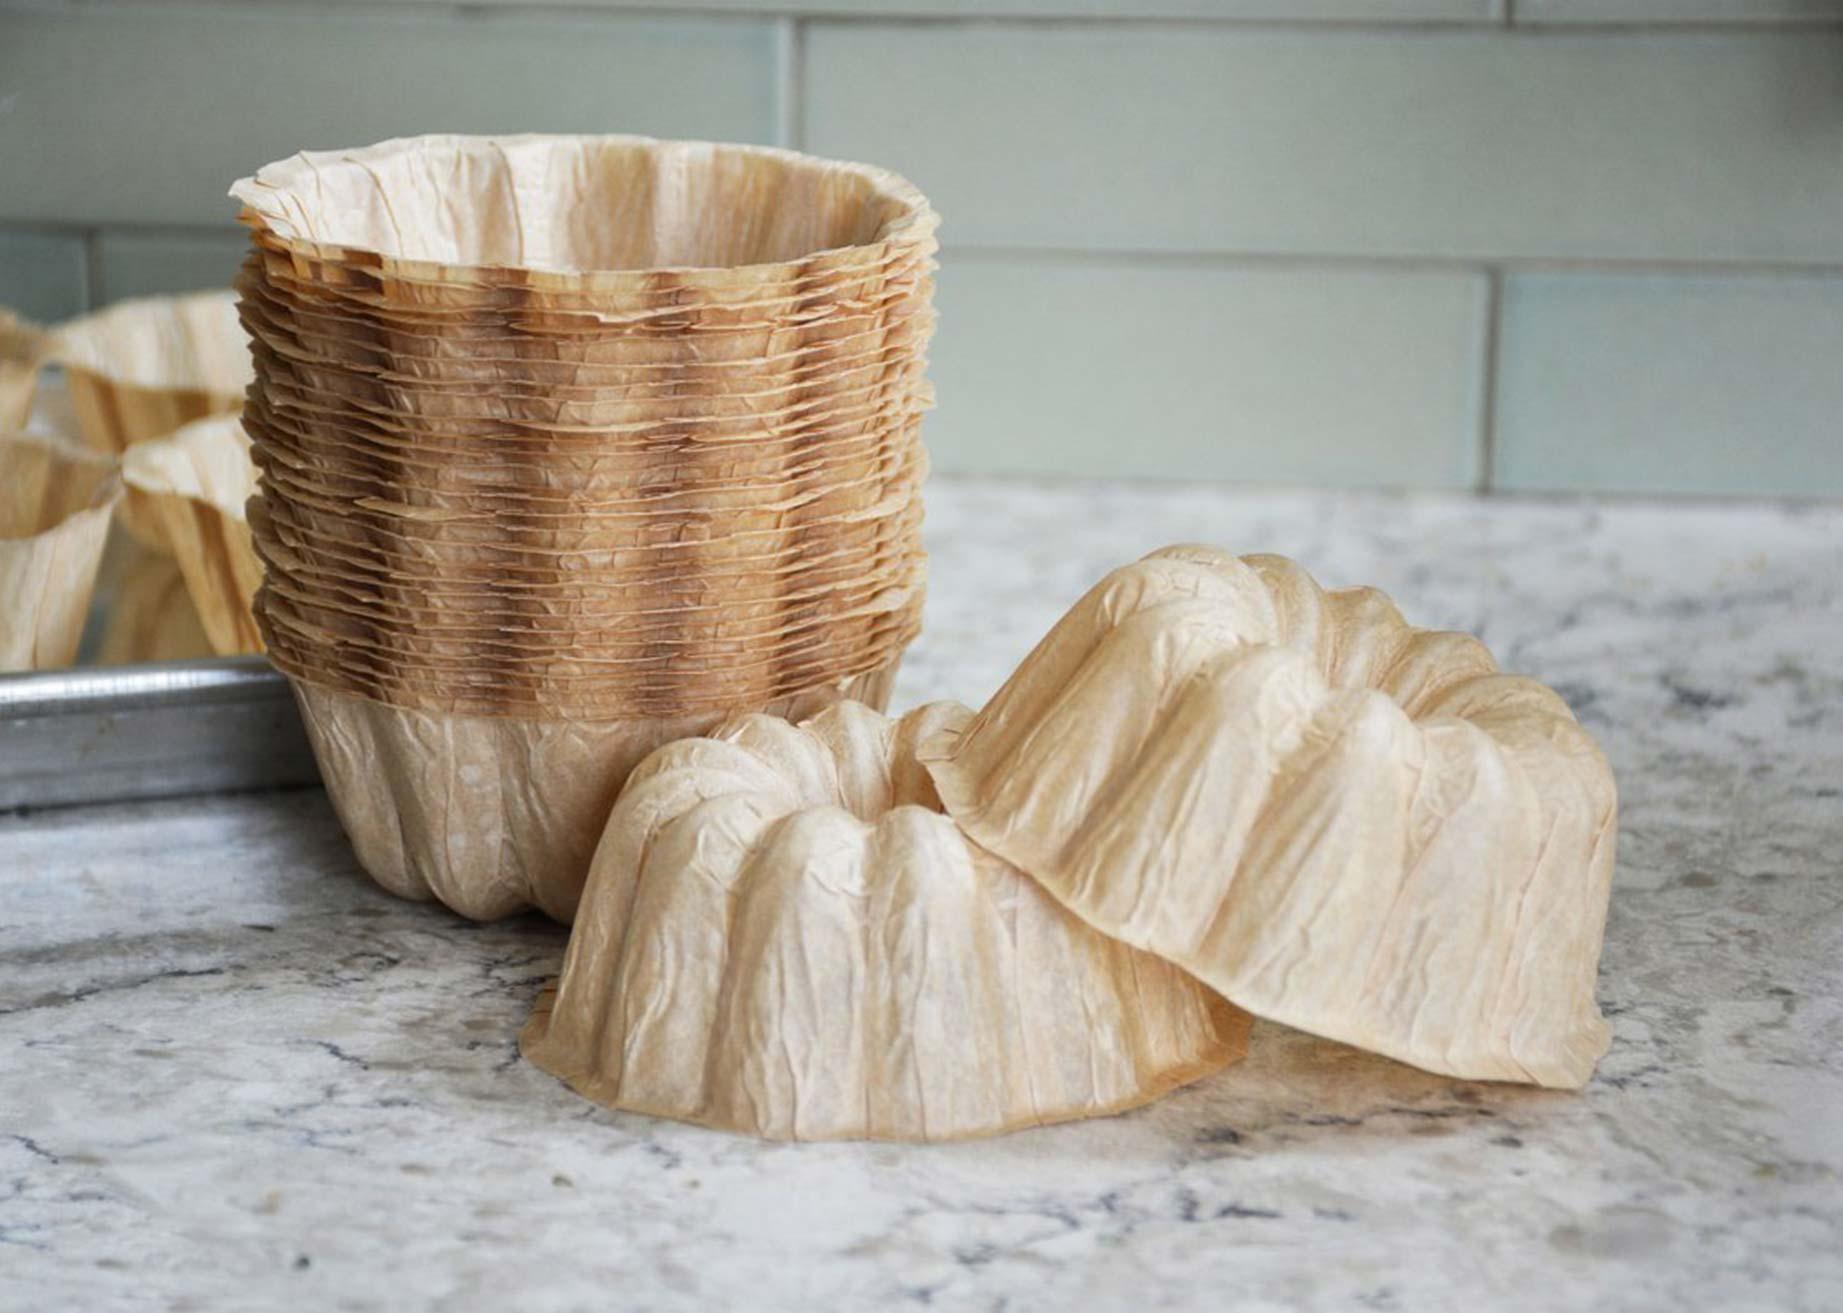 Novacart Bundt Cake baking molds